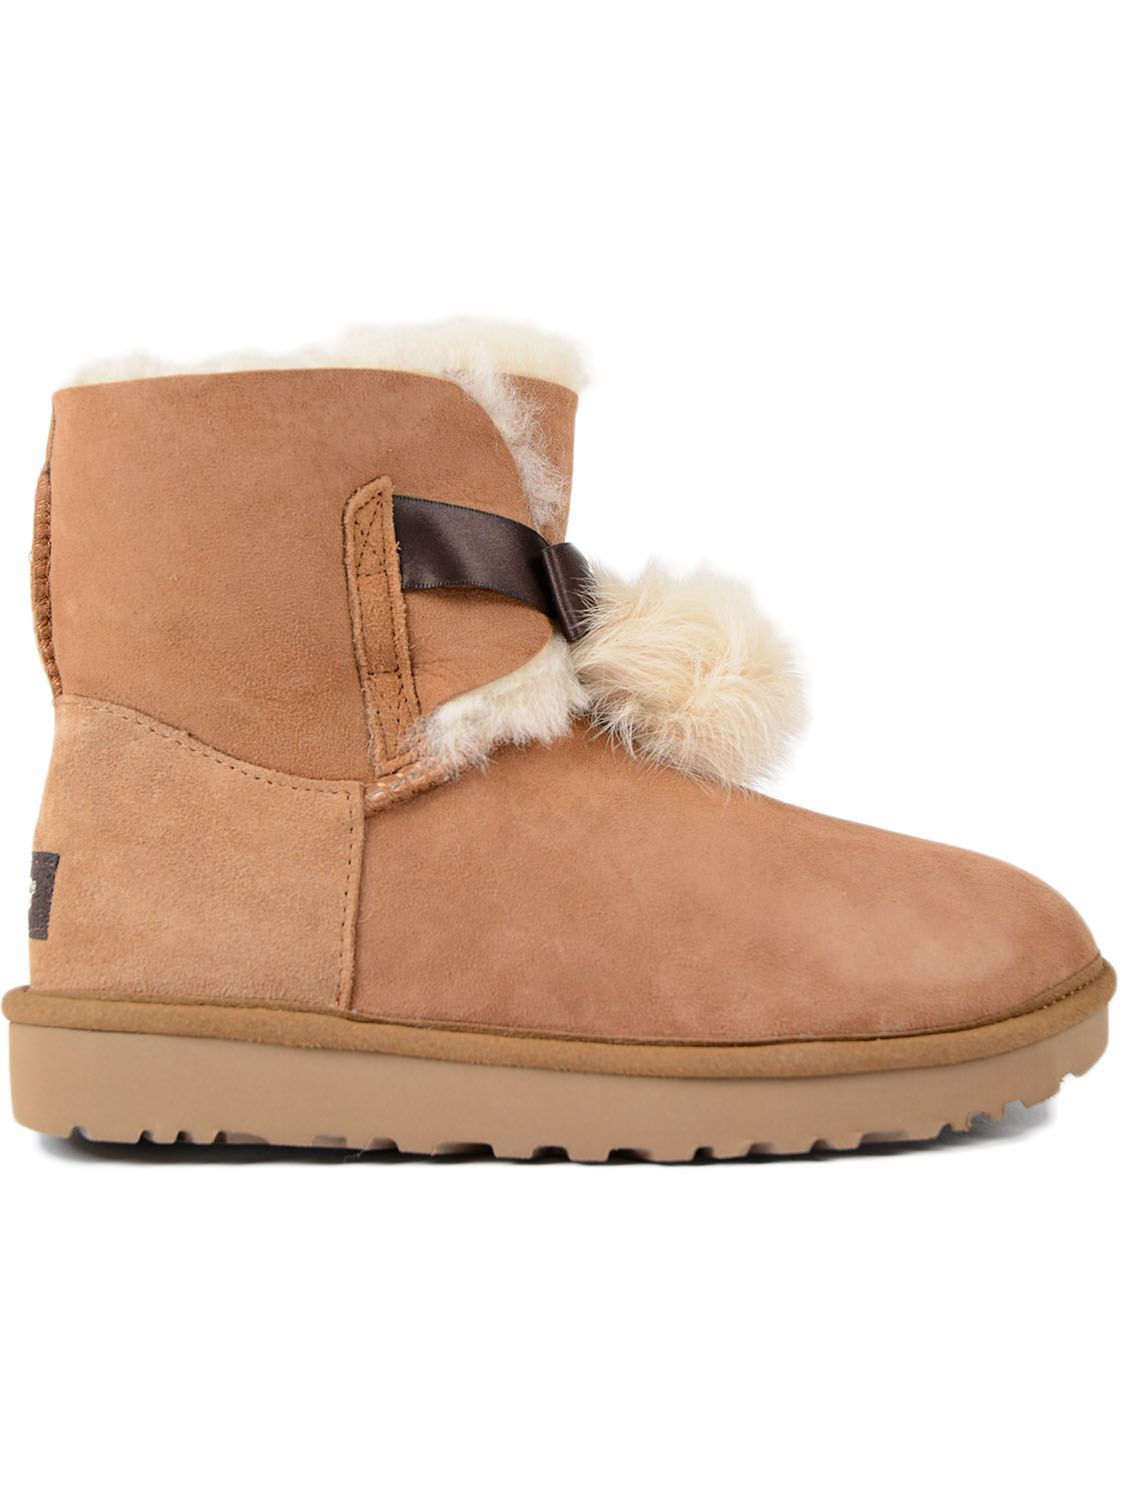 UGG Gita Ankle Boots